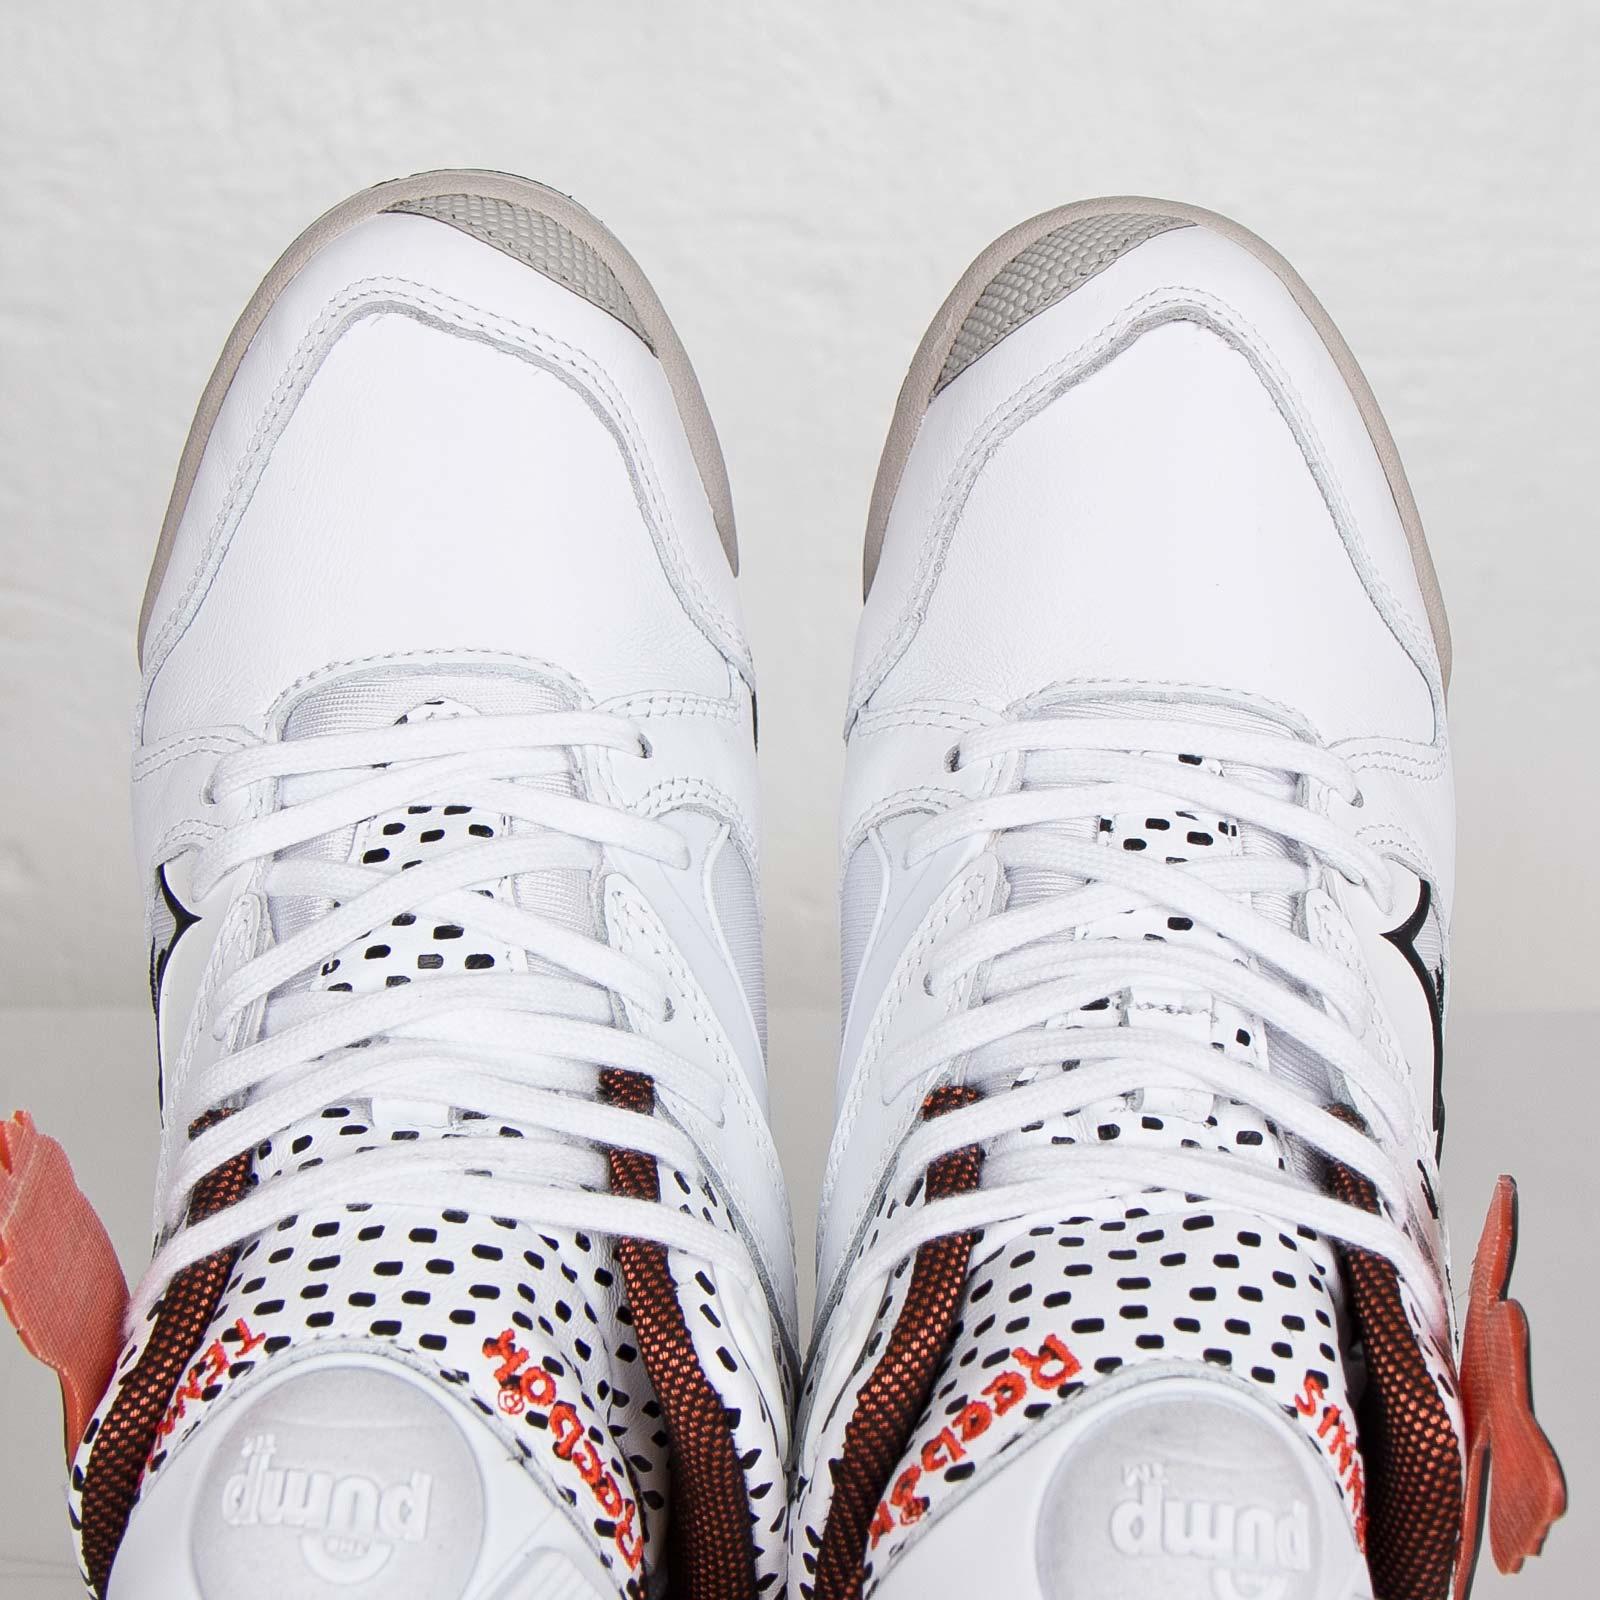 930601e95b276 Reebok Court Victory Pump KH - M40330 - Sneakersnstuff